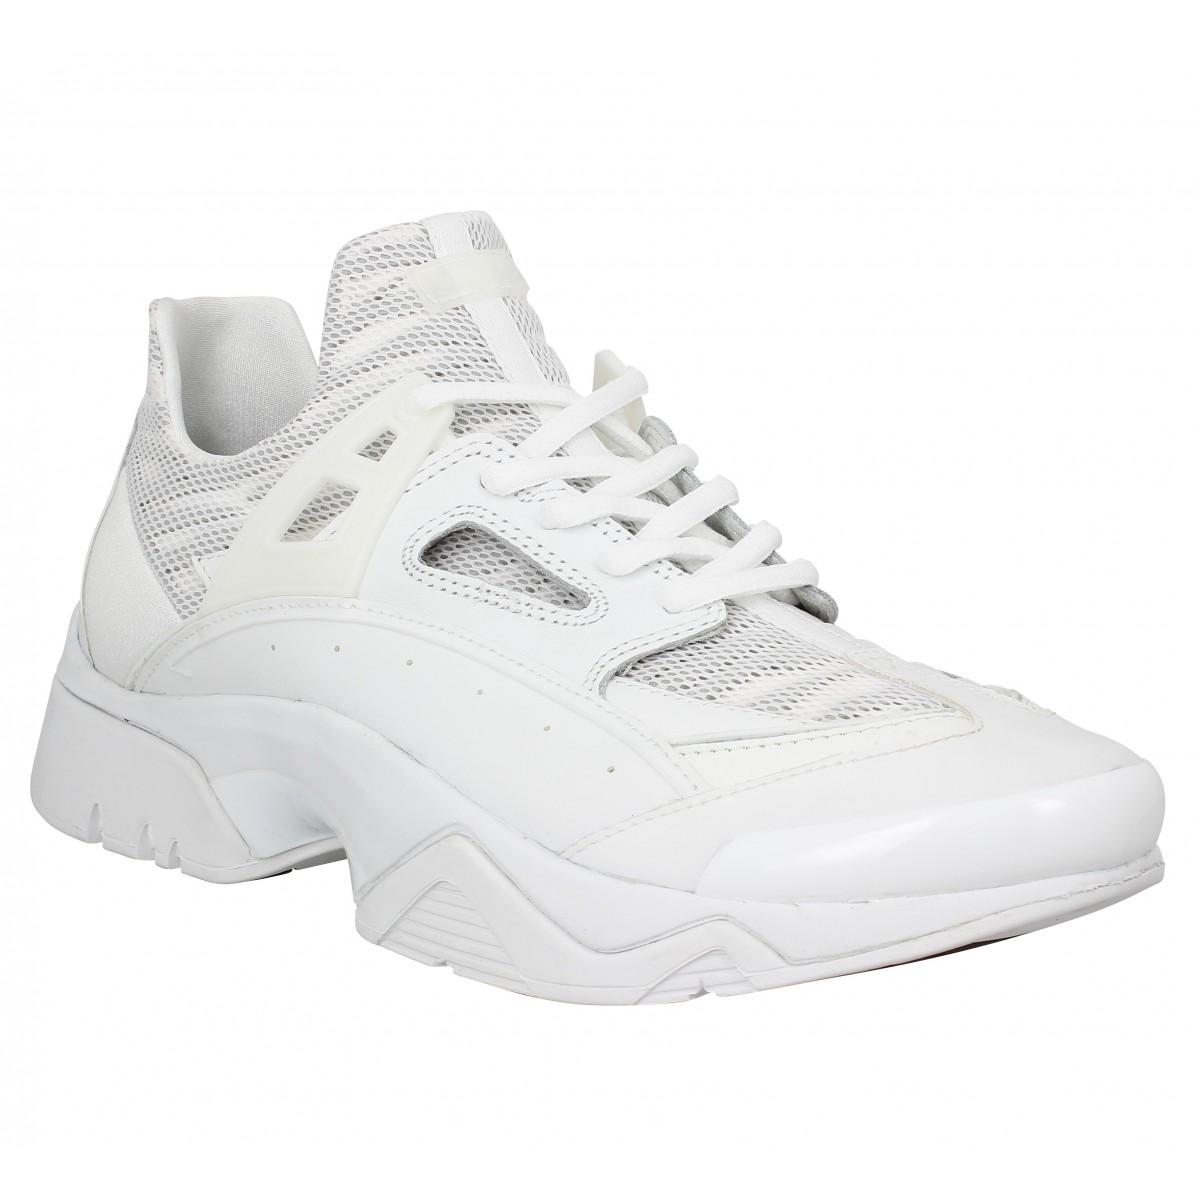 b5d82a19b19 Chaussures Kenzo sonic blanc homme